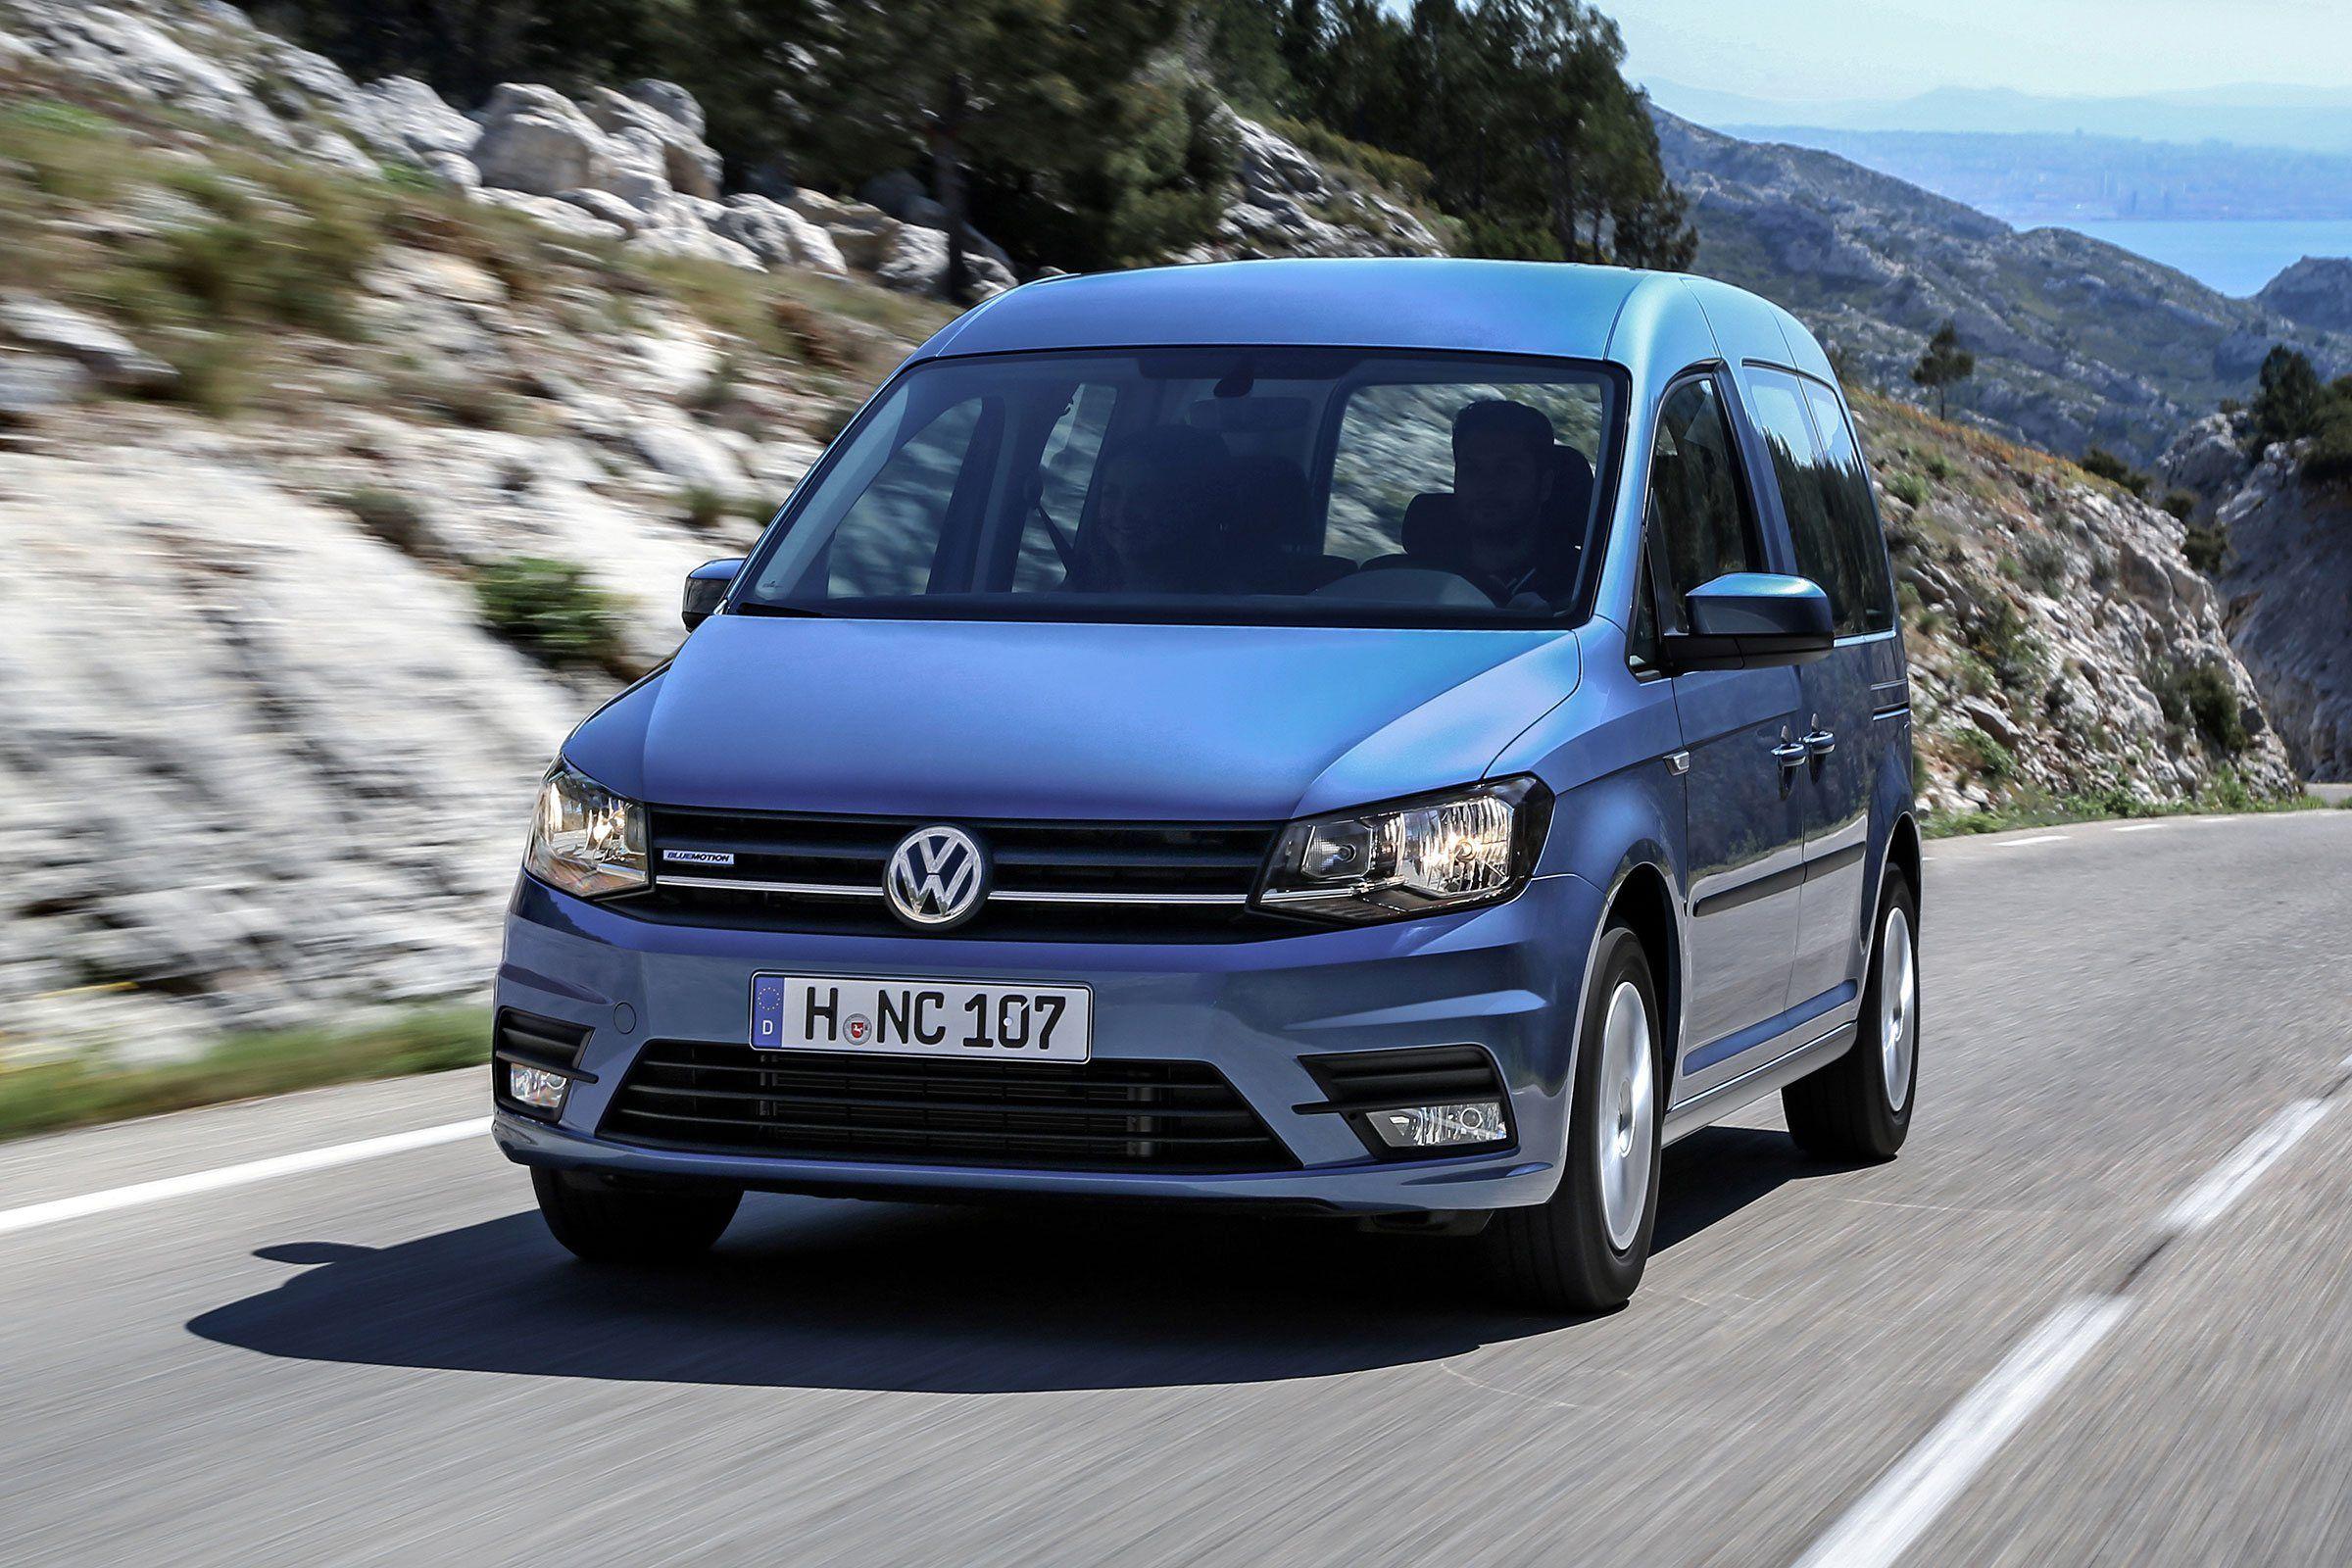 2021 Vw Caddy Reviews in 2020 | Volkswagen caddy ...